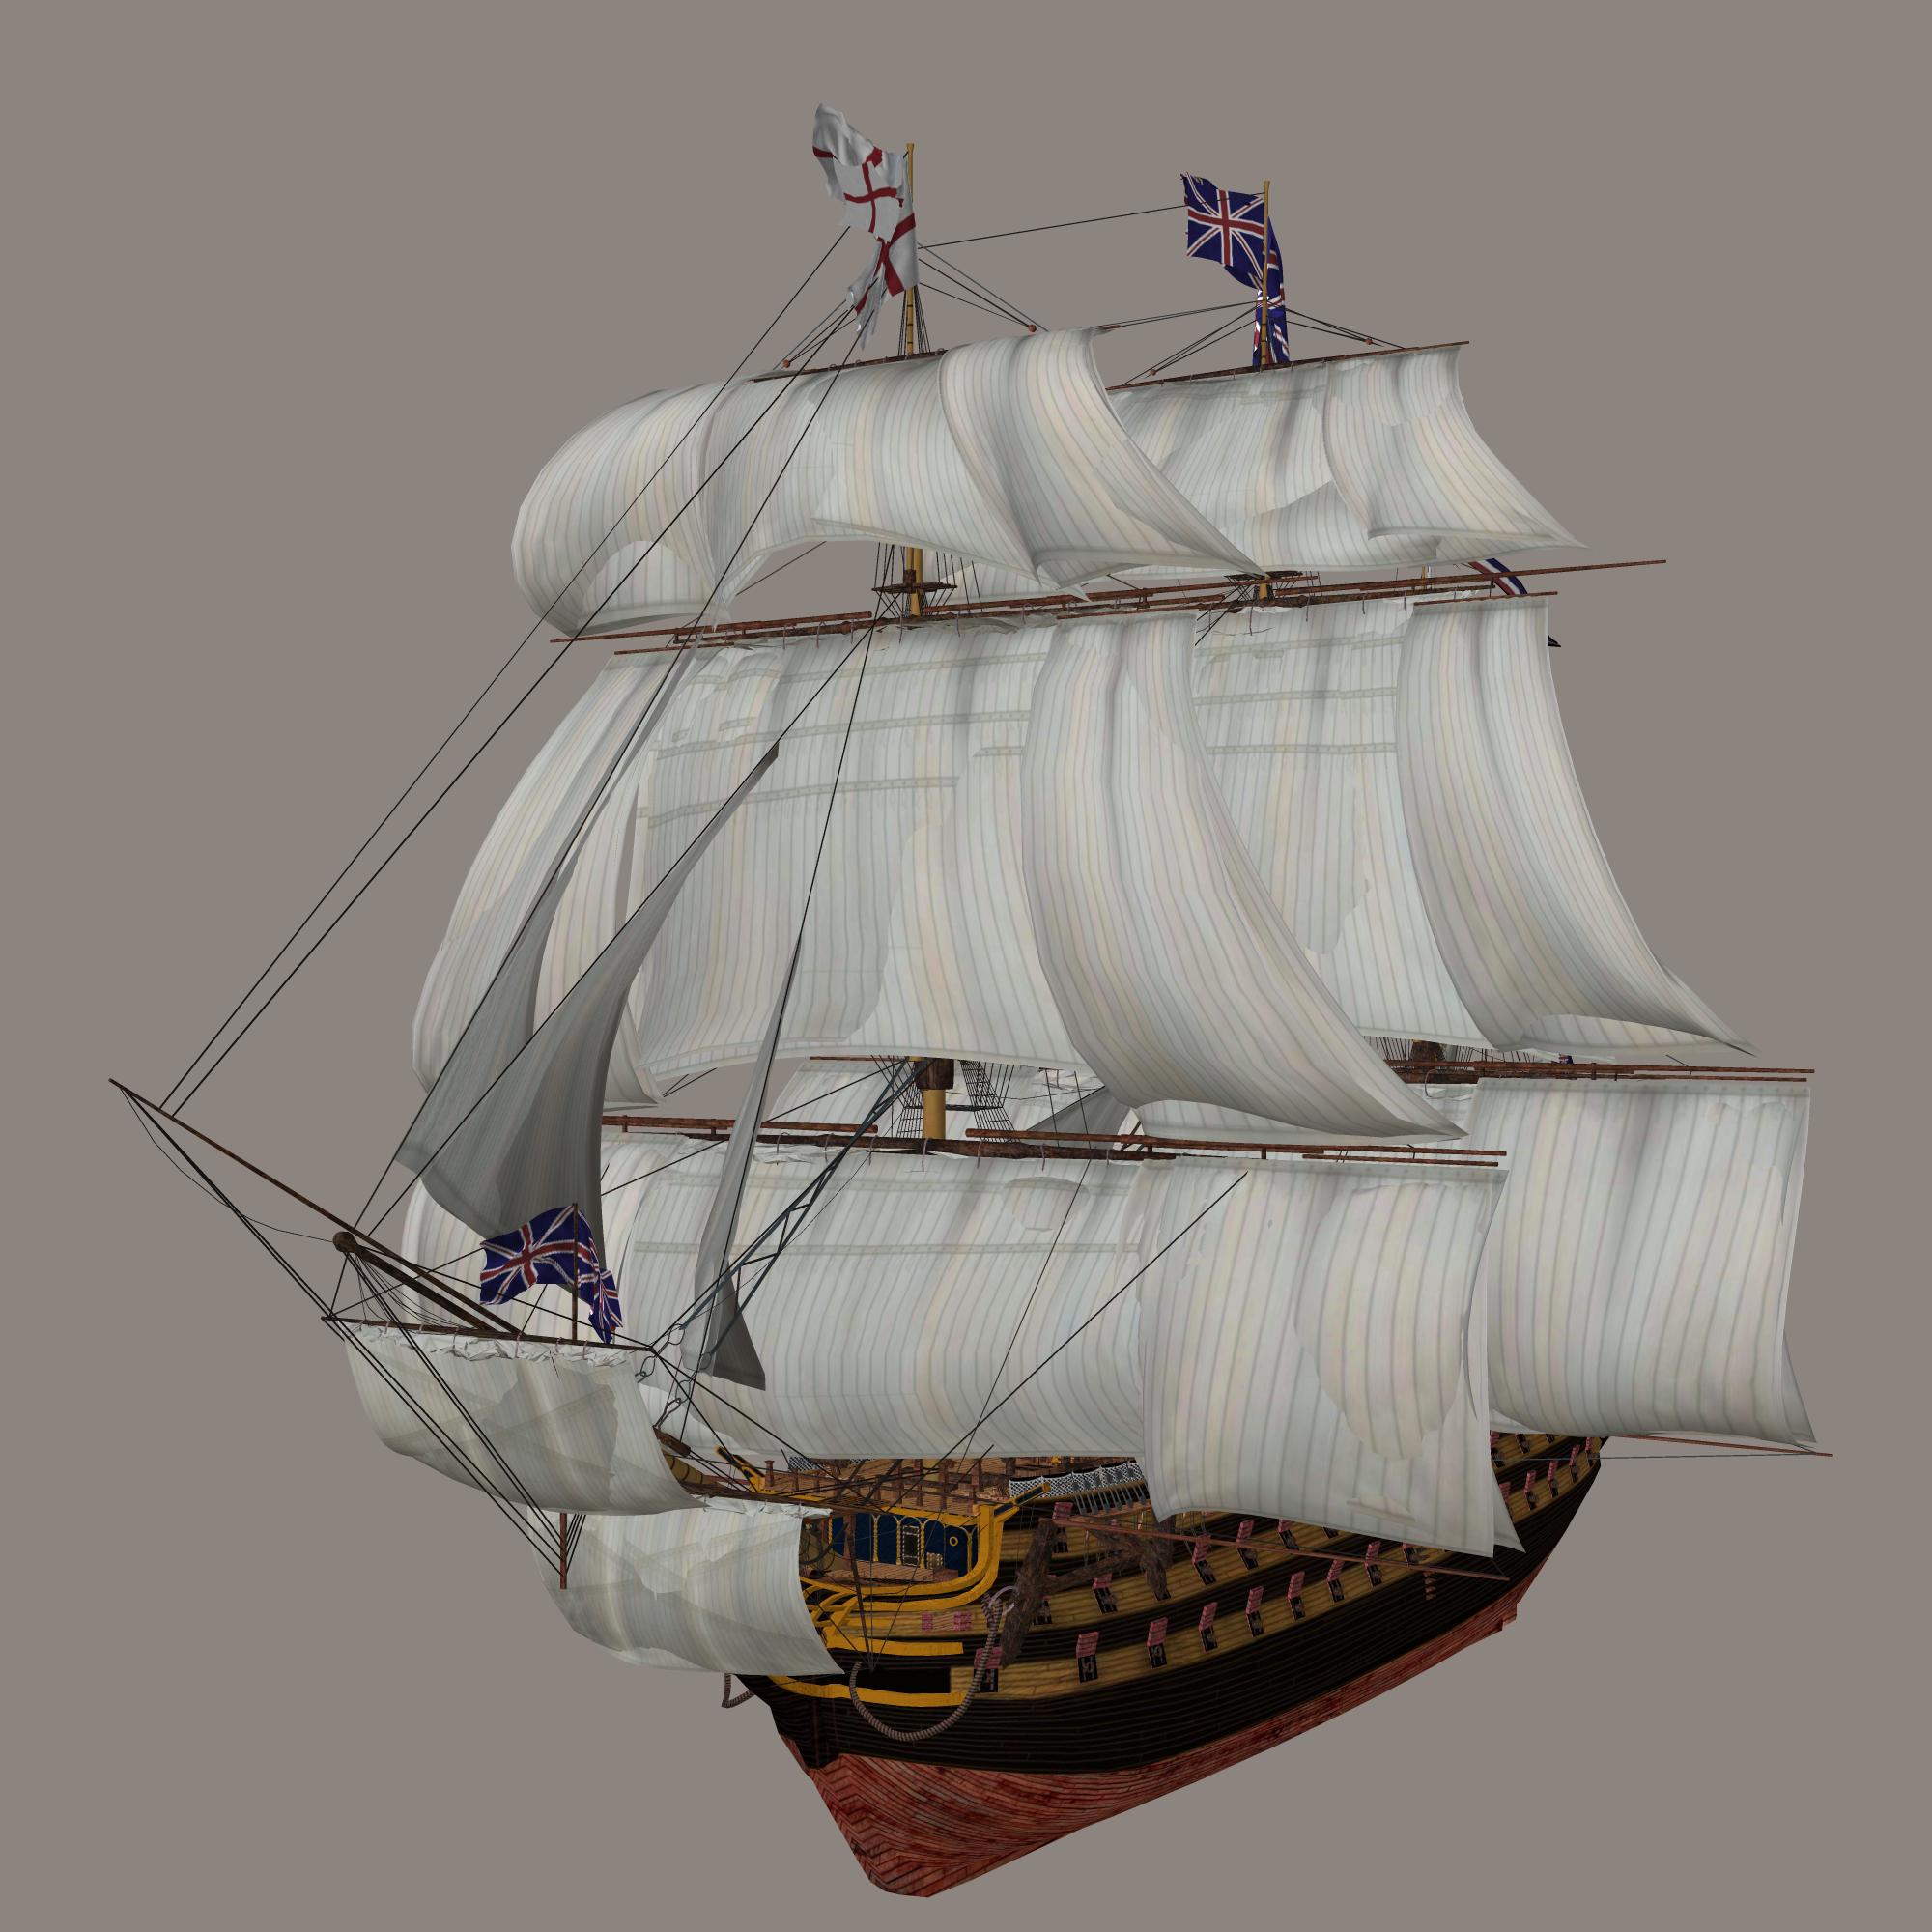 Sailing Ship Png Image Sailing Ships Pirate Ship Model Pirate Ship